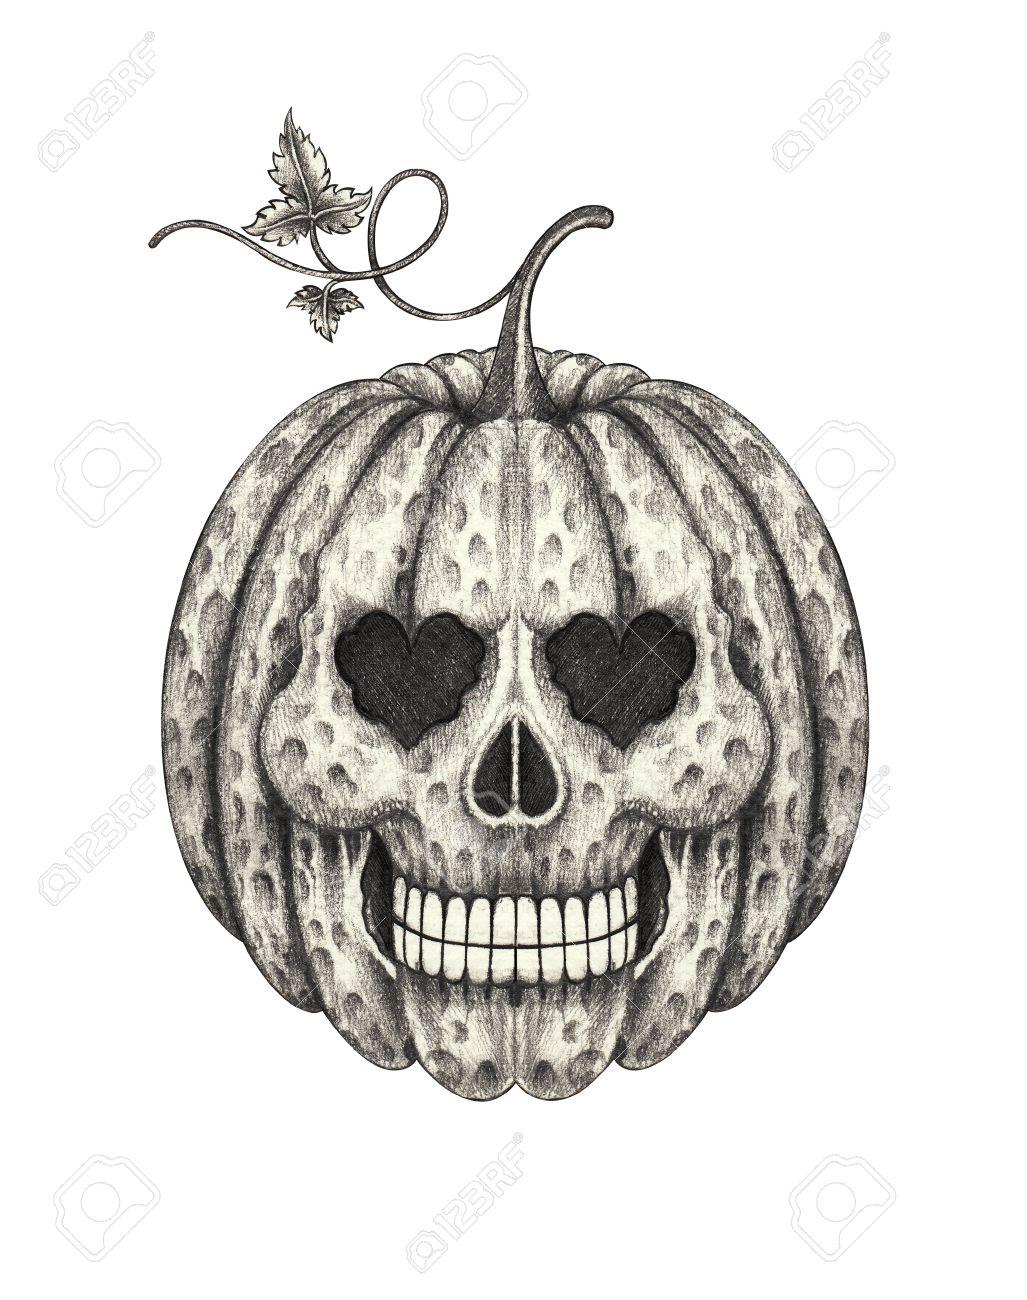 Skull Head Pumpkin Halloween Hand Pencil Drawing On Paper Stock